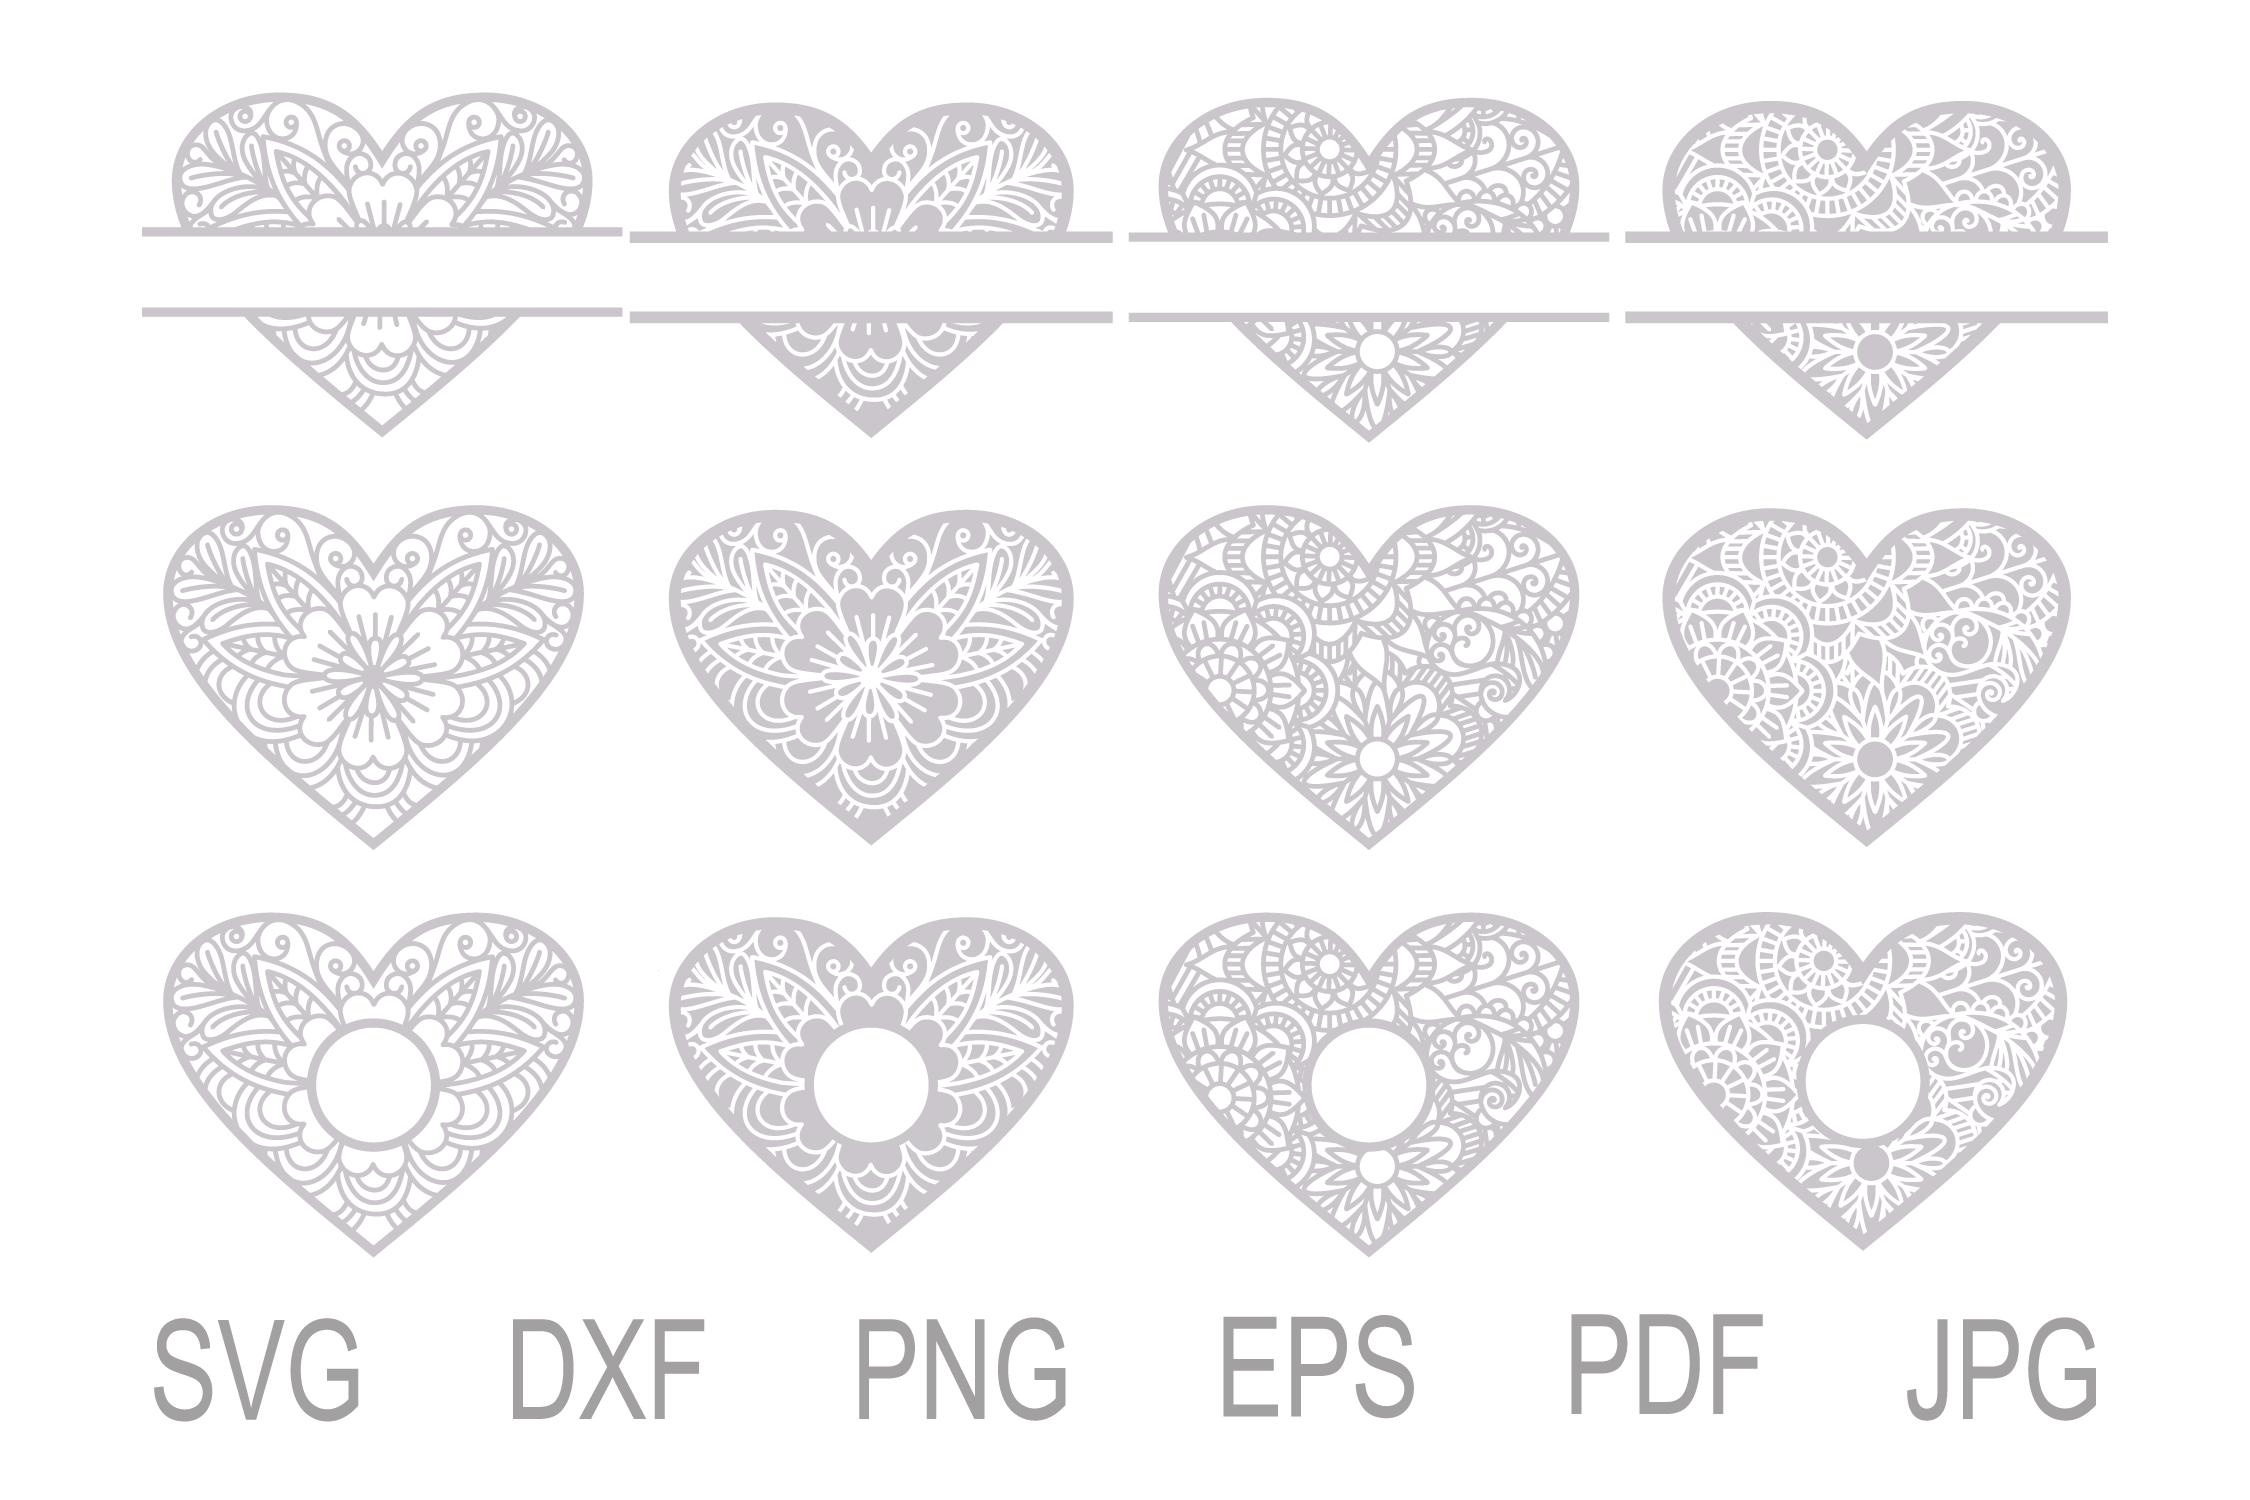 Heart SVG, Zentangle Heart SVG, Mandala Heart, Heart Frames example image 2